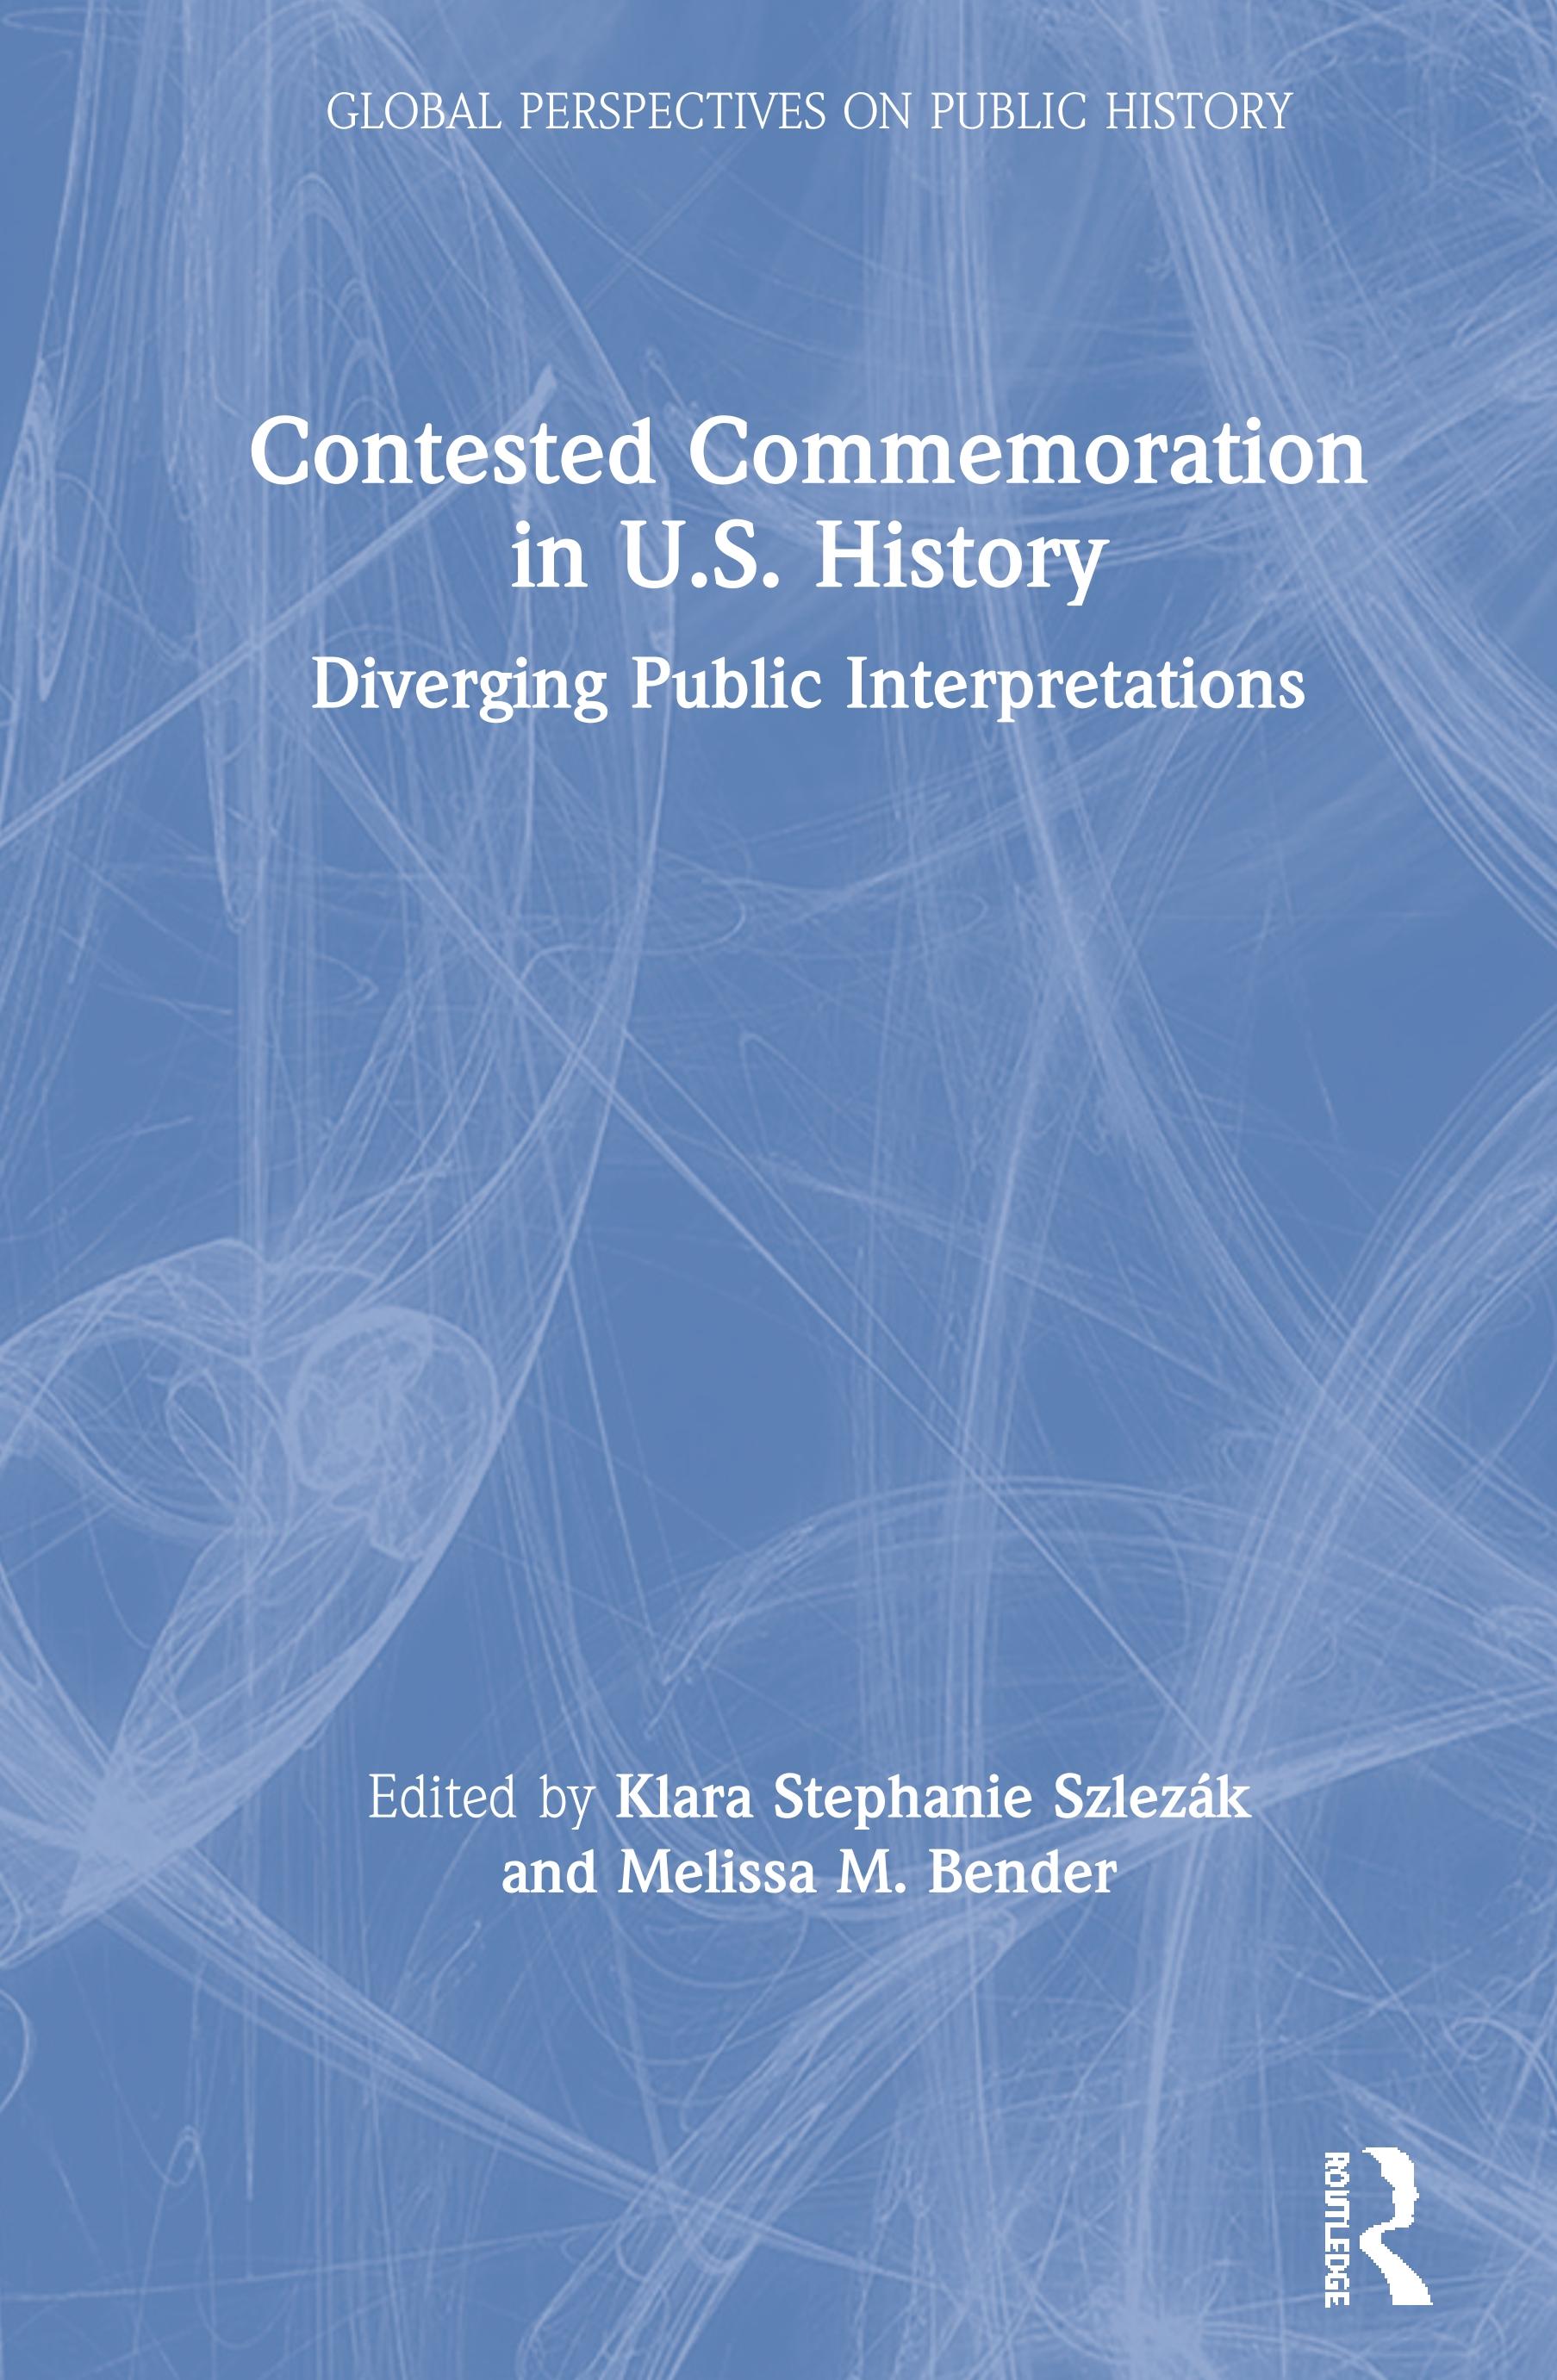 Contested Commemoration in U.S. History: Diverging Public Interpretations, 1st Edition (Hardback) book cover